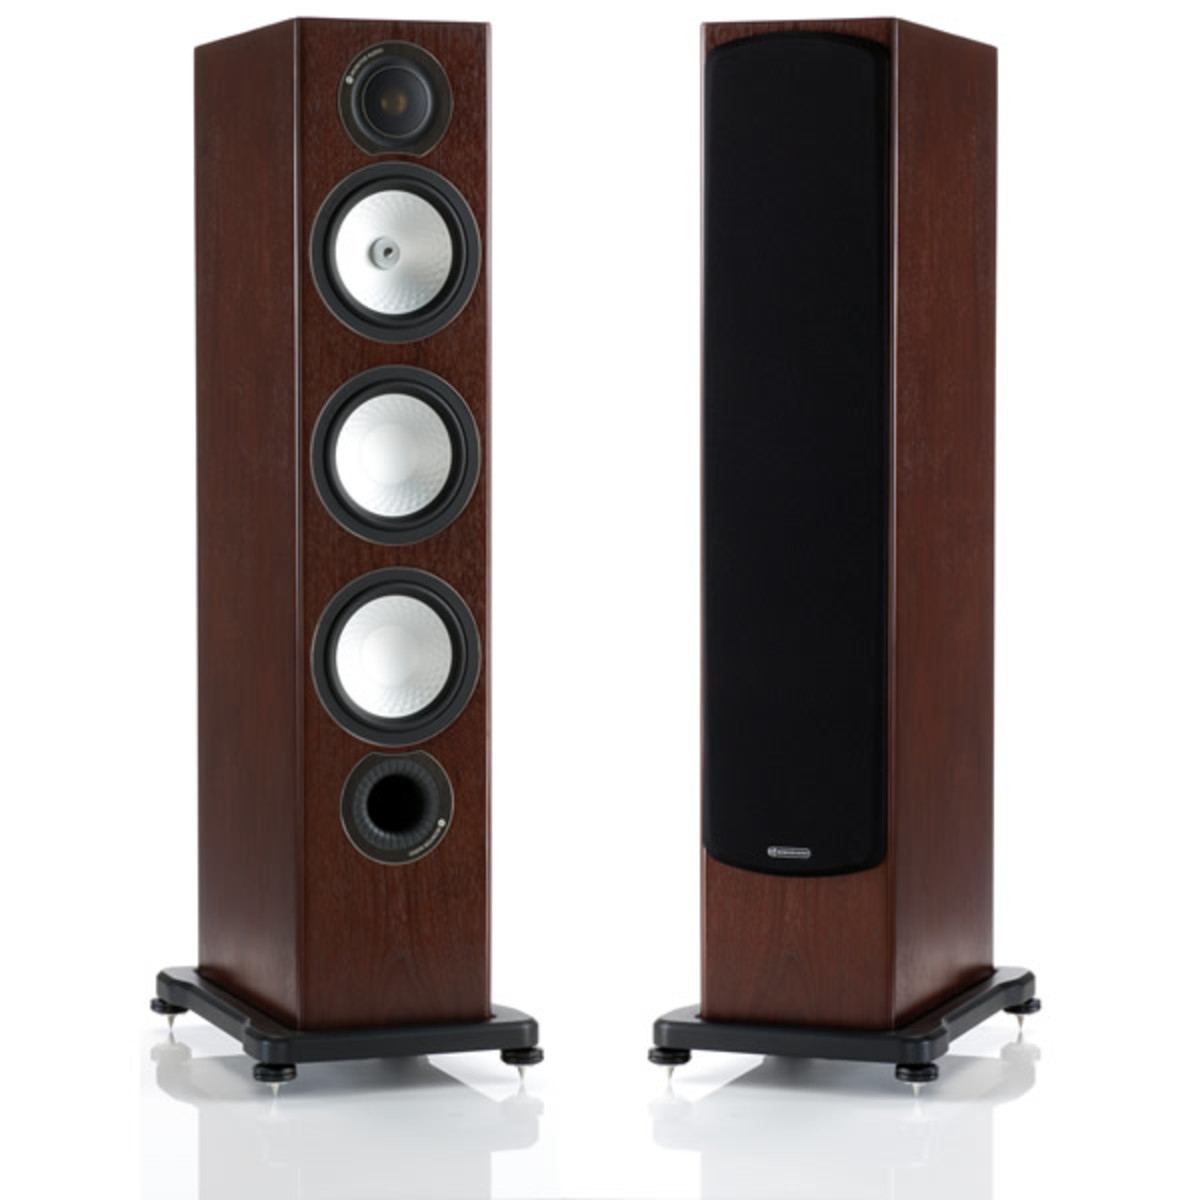 Monitor Audio RX8 loudspeakers